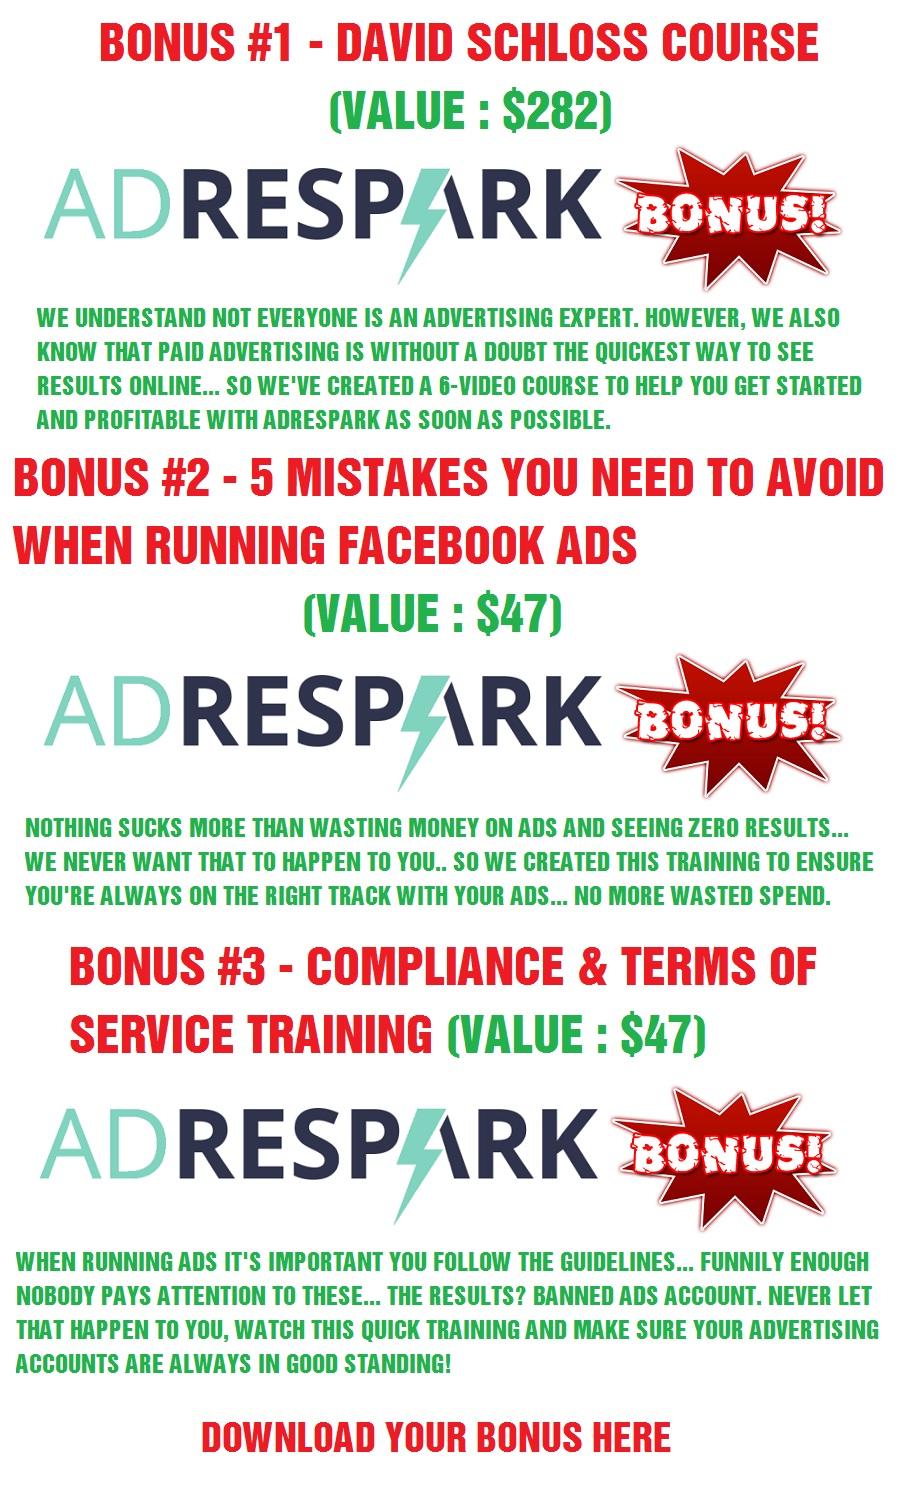 AdRespark Bonus